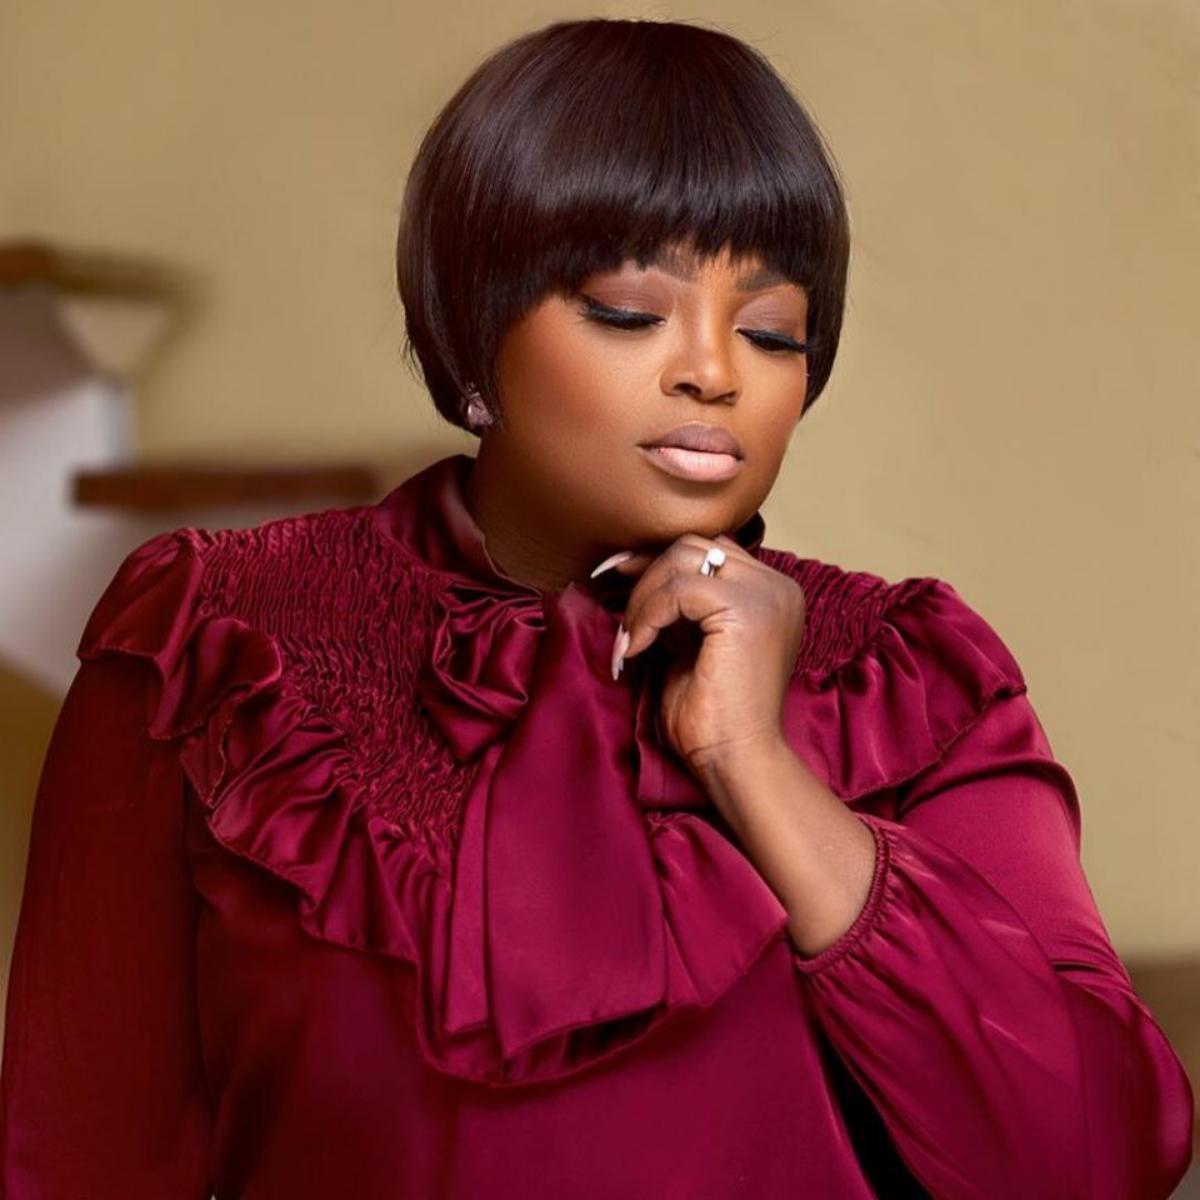 Funke Akindele Bello Shares Her Ordeal At Chicken Republic